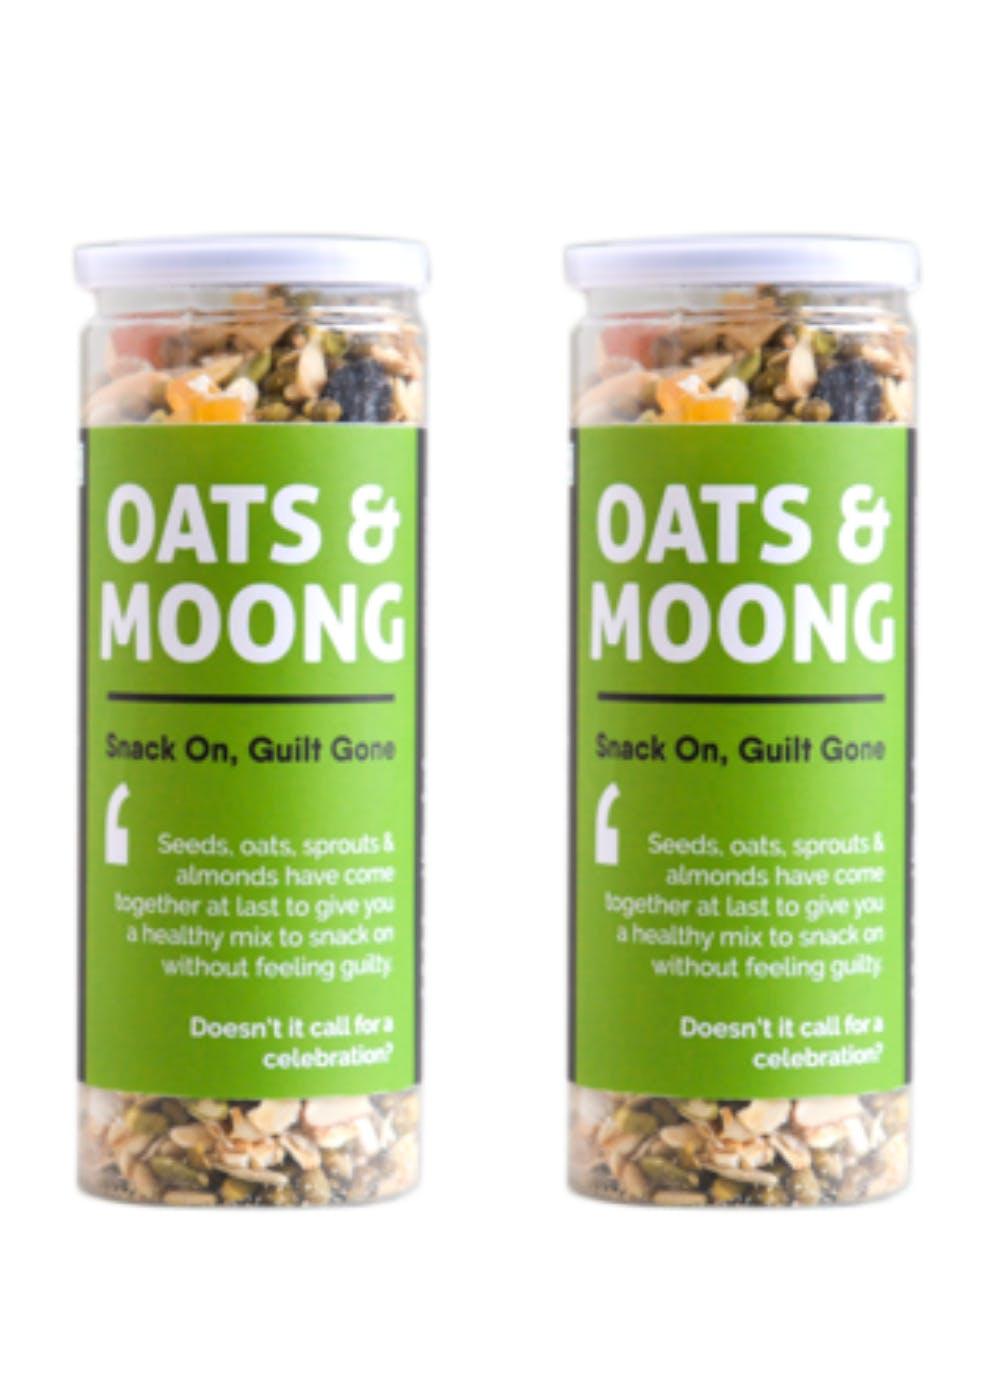 Oats & Moong Mix - Pack of 2